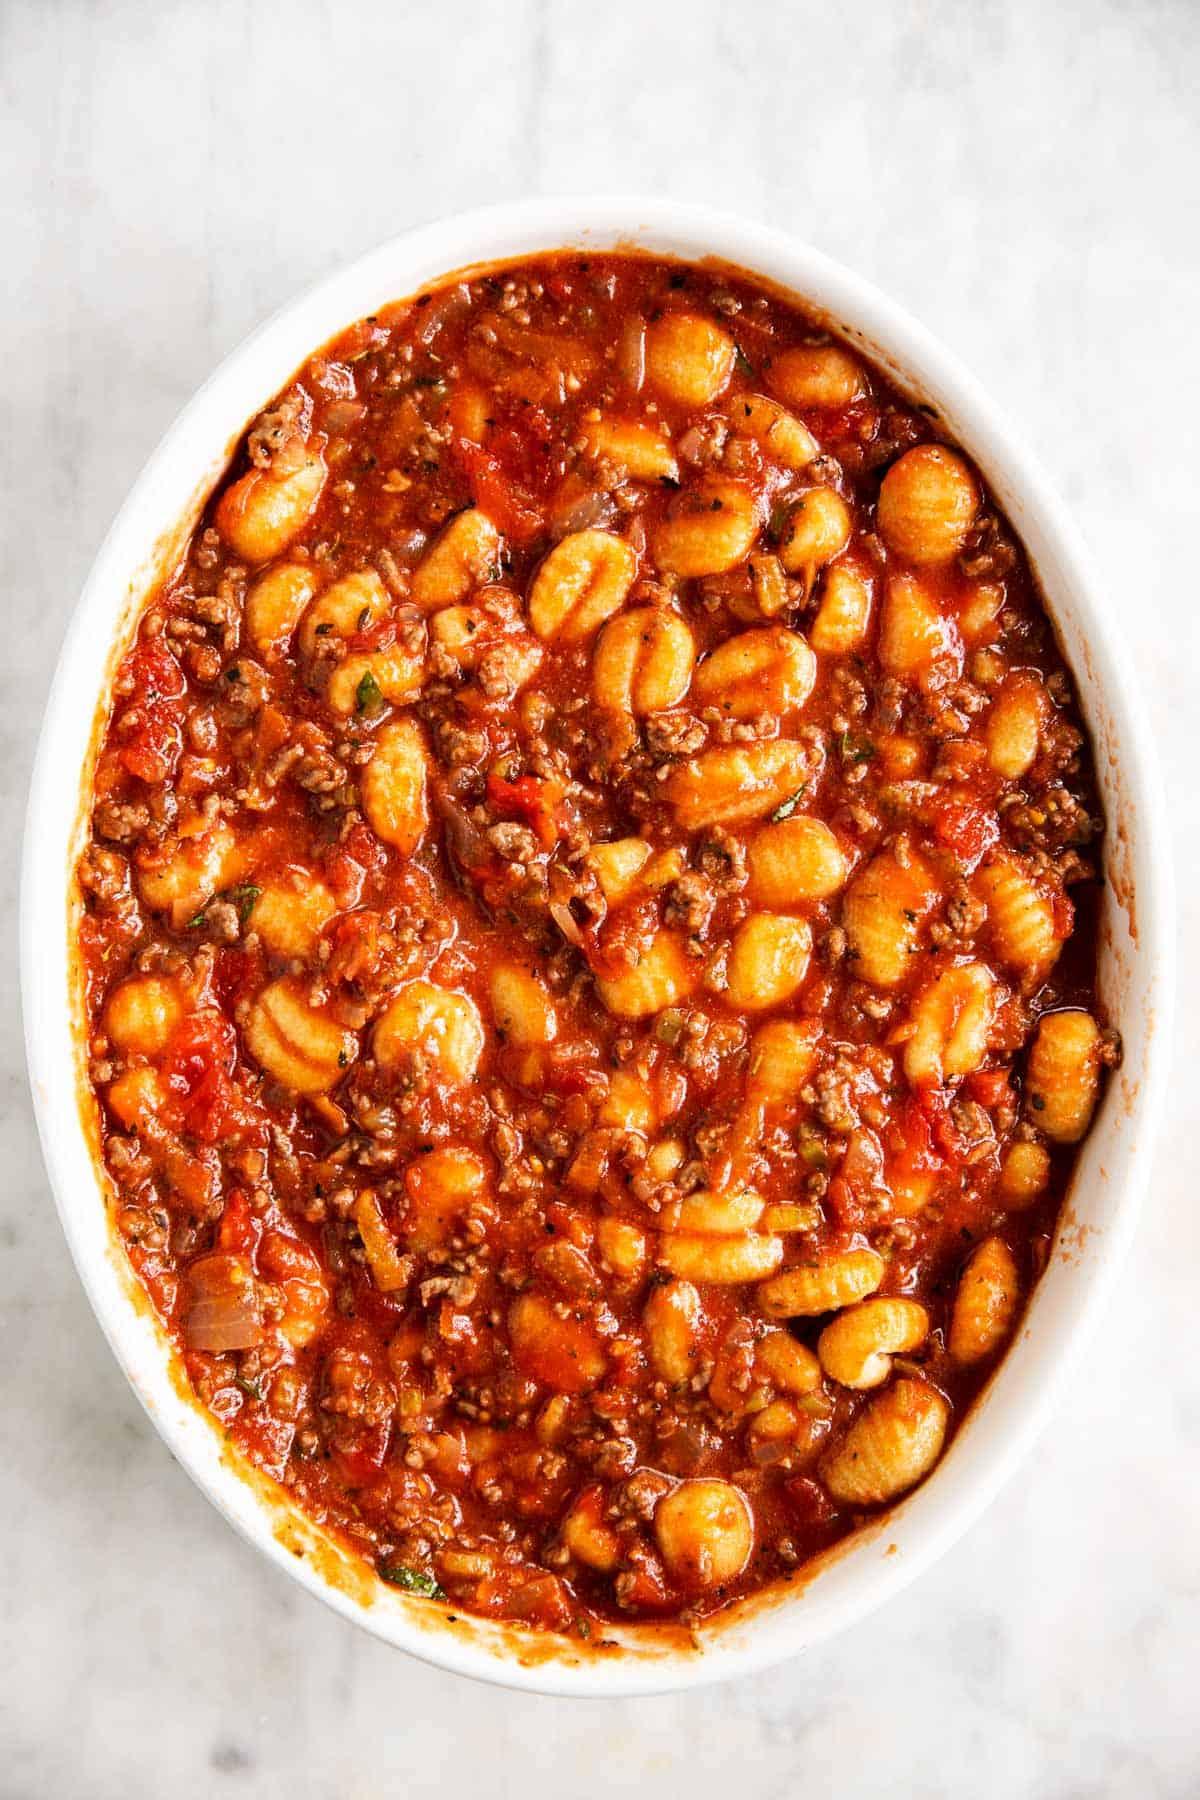 gnocchi, ground beef and tomato sauce mixture in white casserole dish